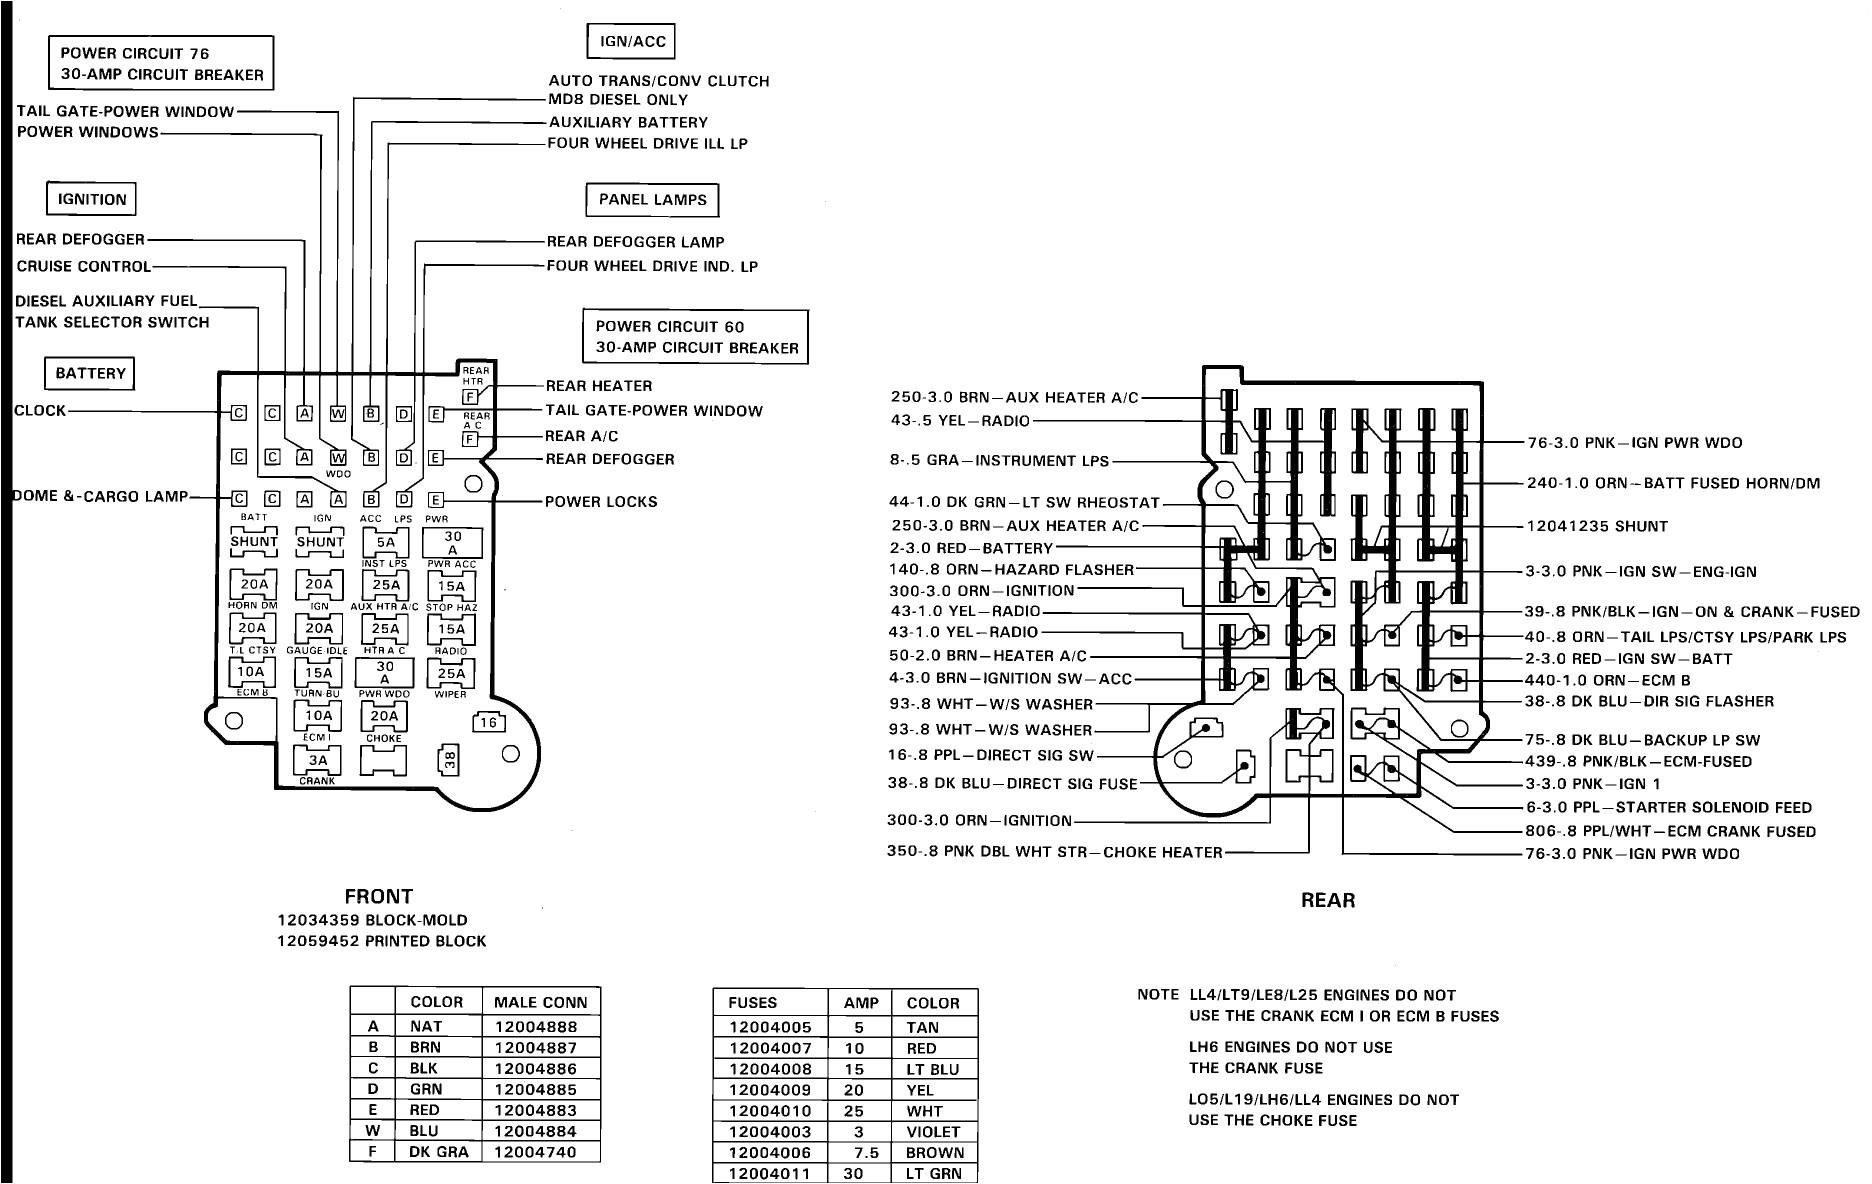 pump fuse box wiring diagram pagepump fuse box schema diagram database fuse box diagram in addition